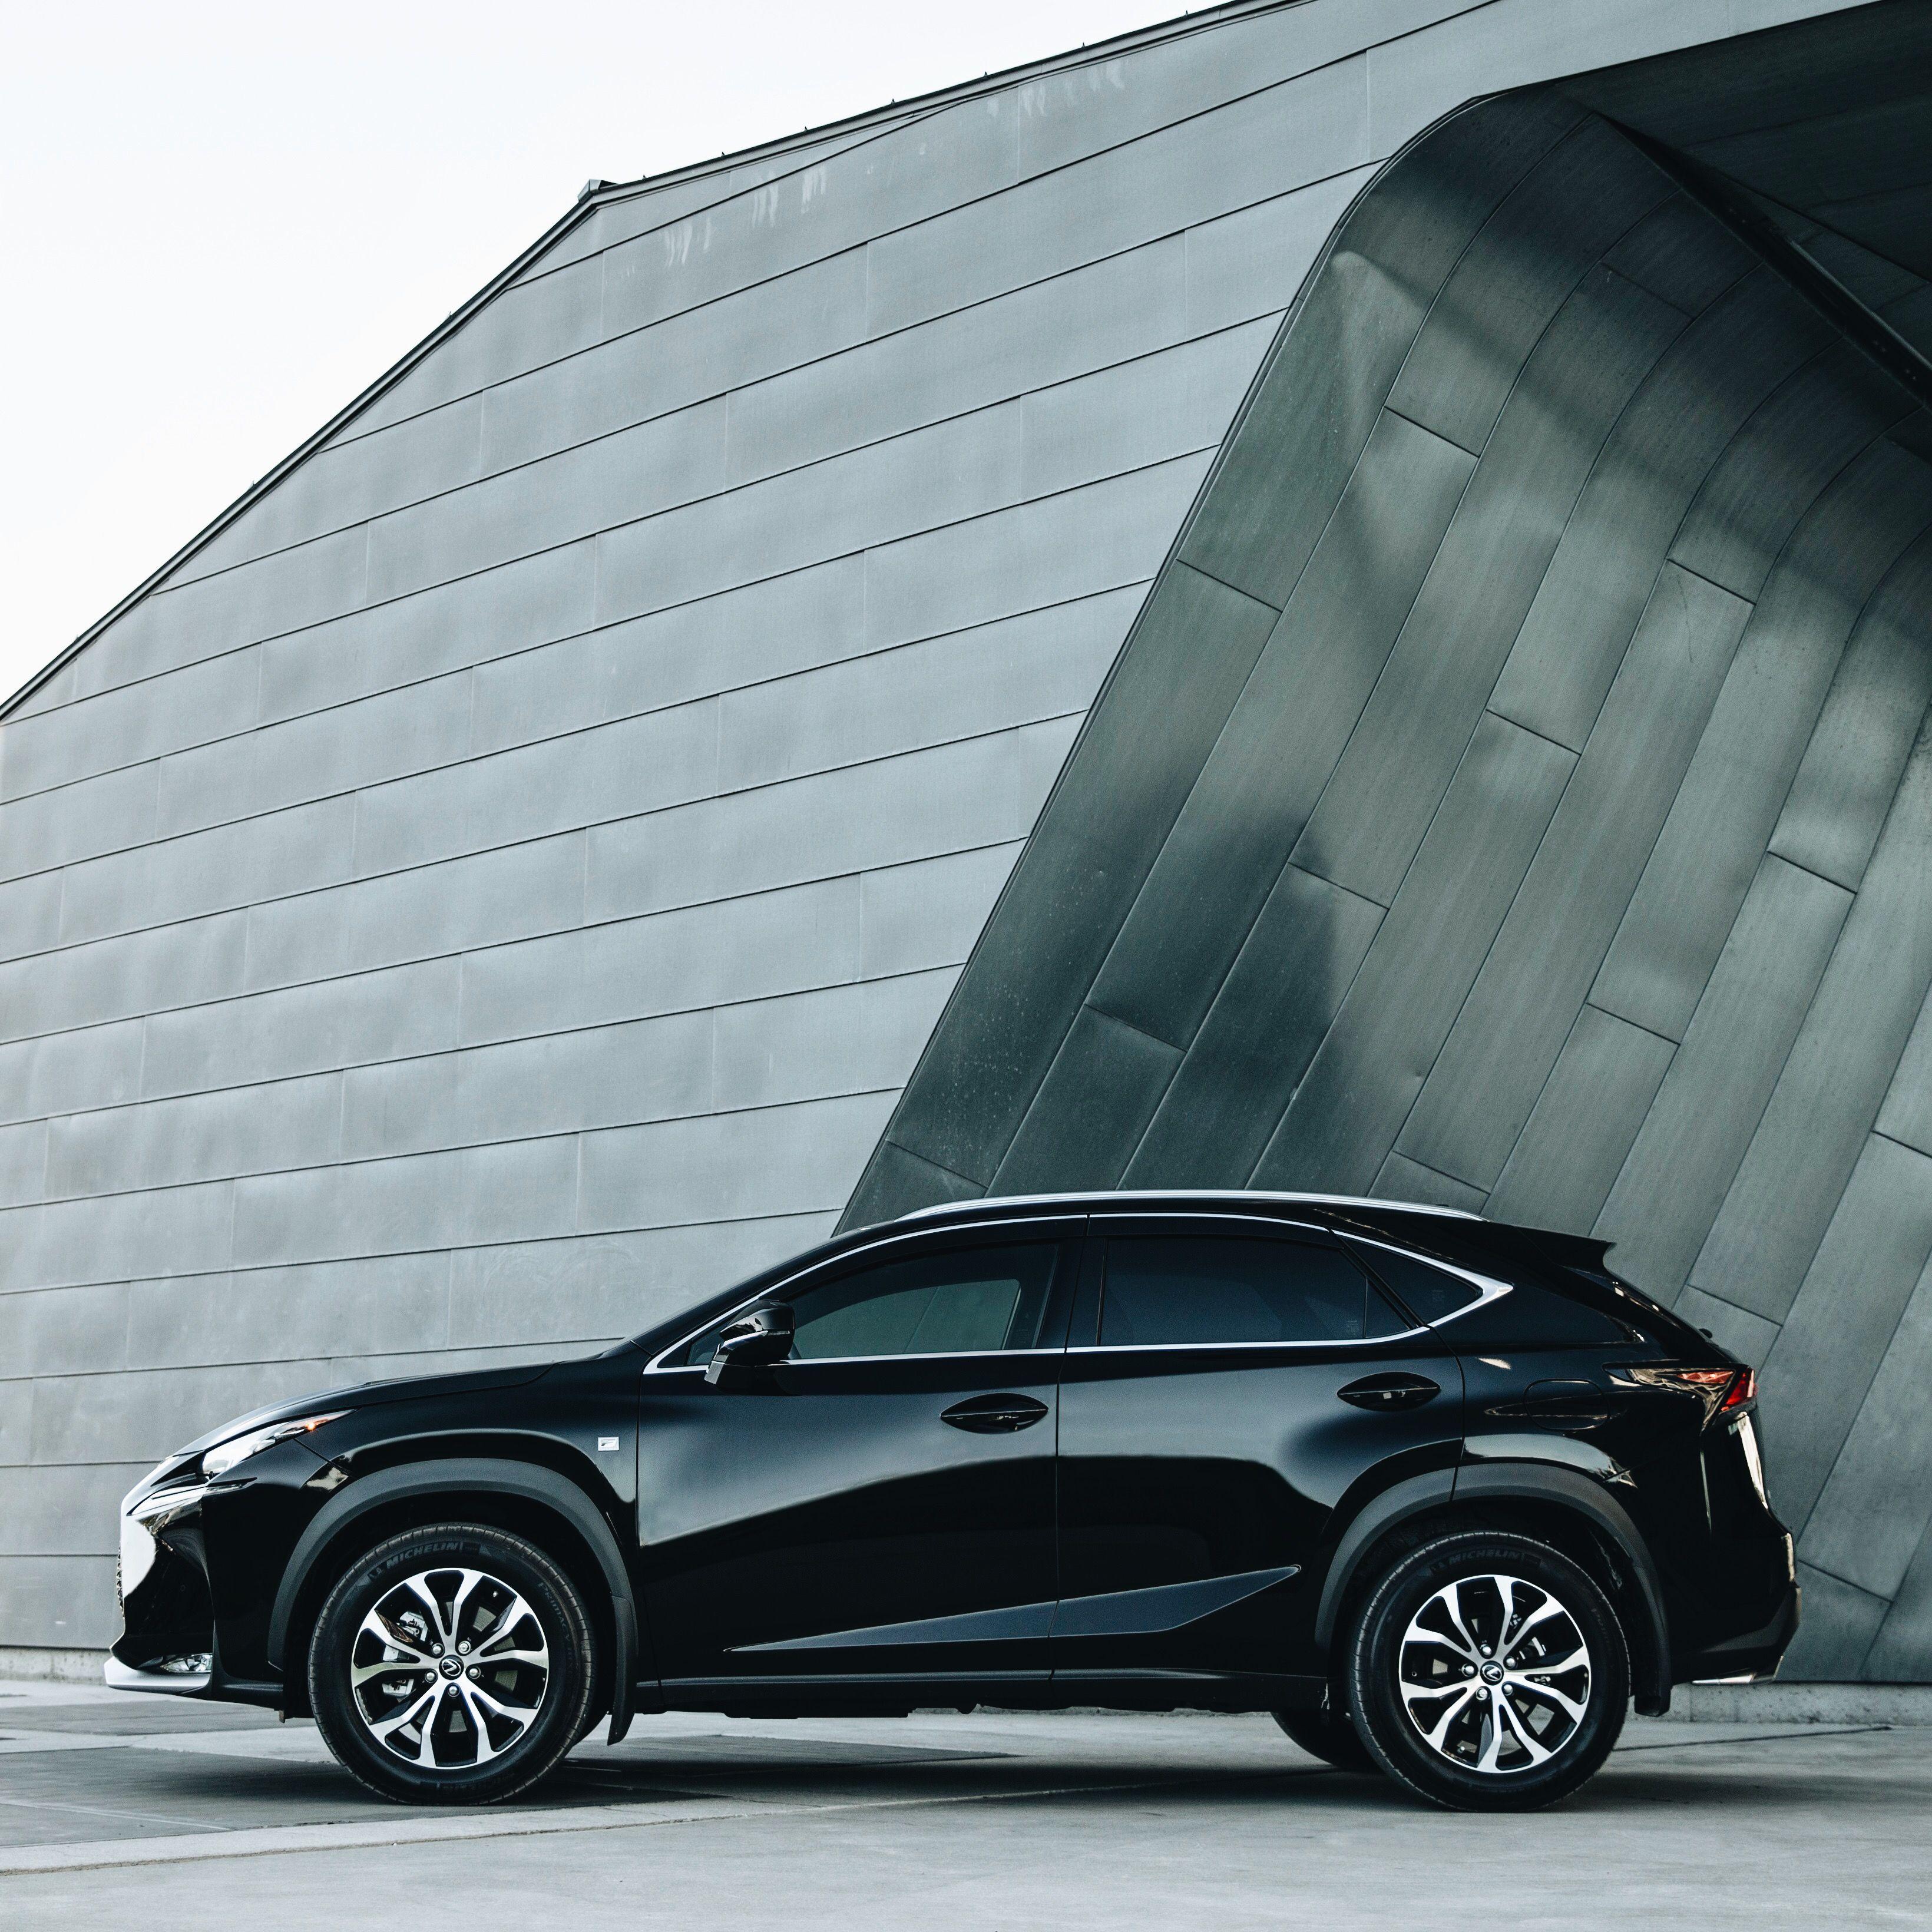 Lexus NX 300 in 2020 Lexus suv, New lexus, New lexus suv